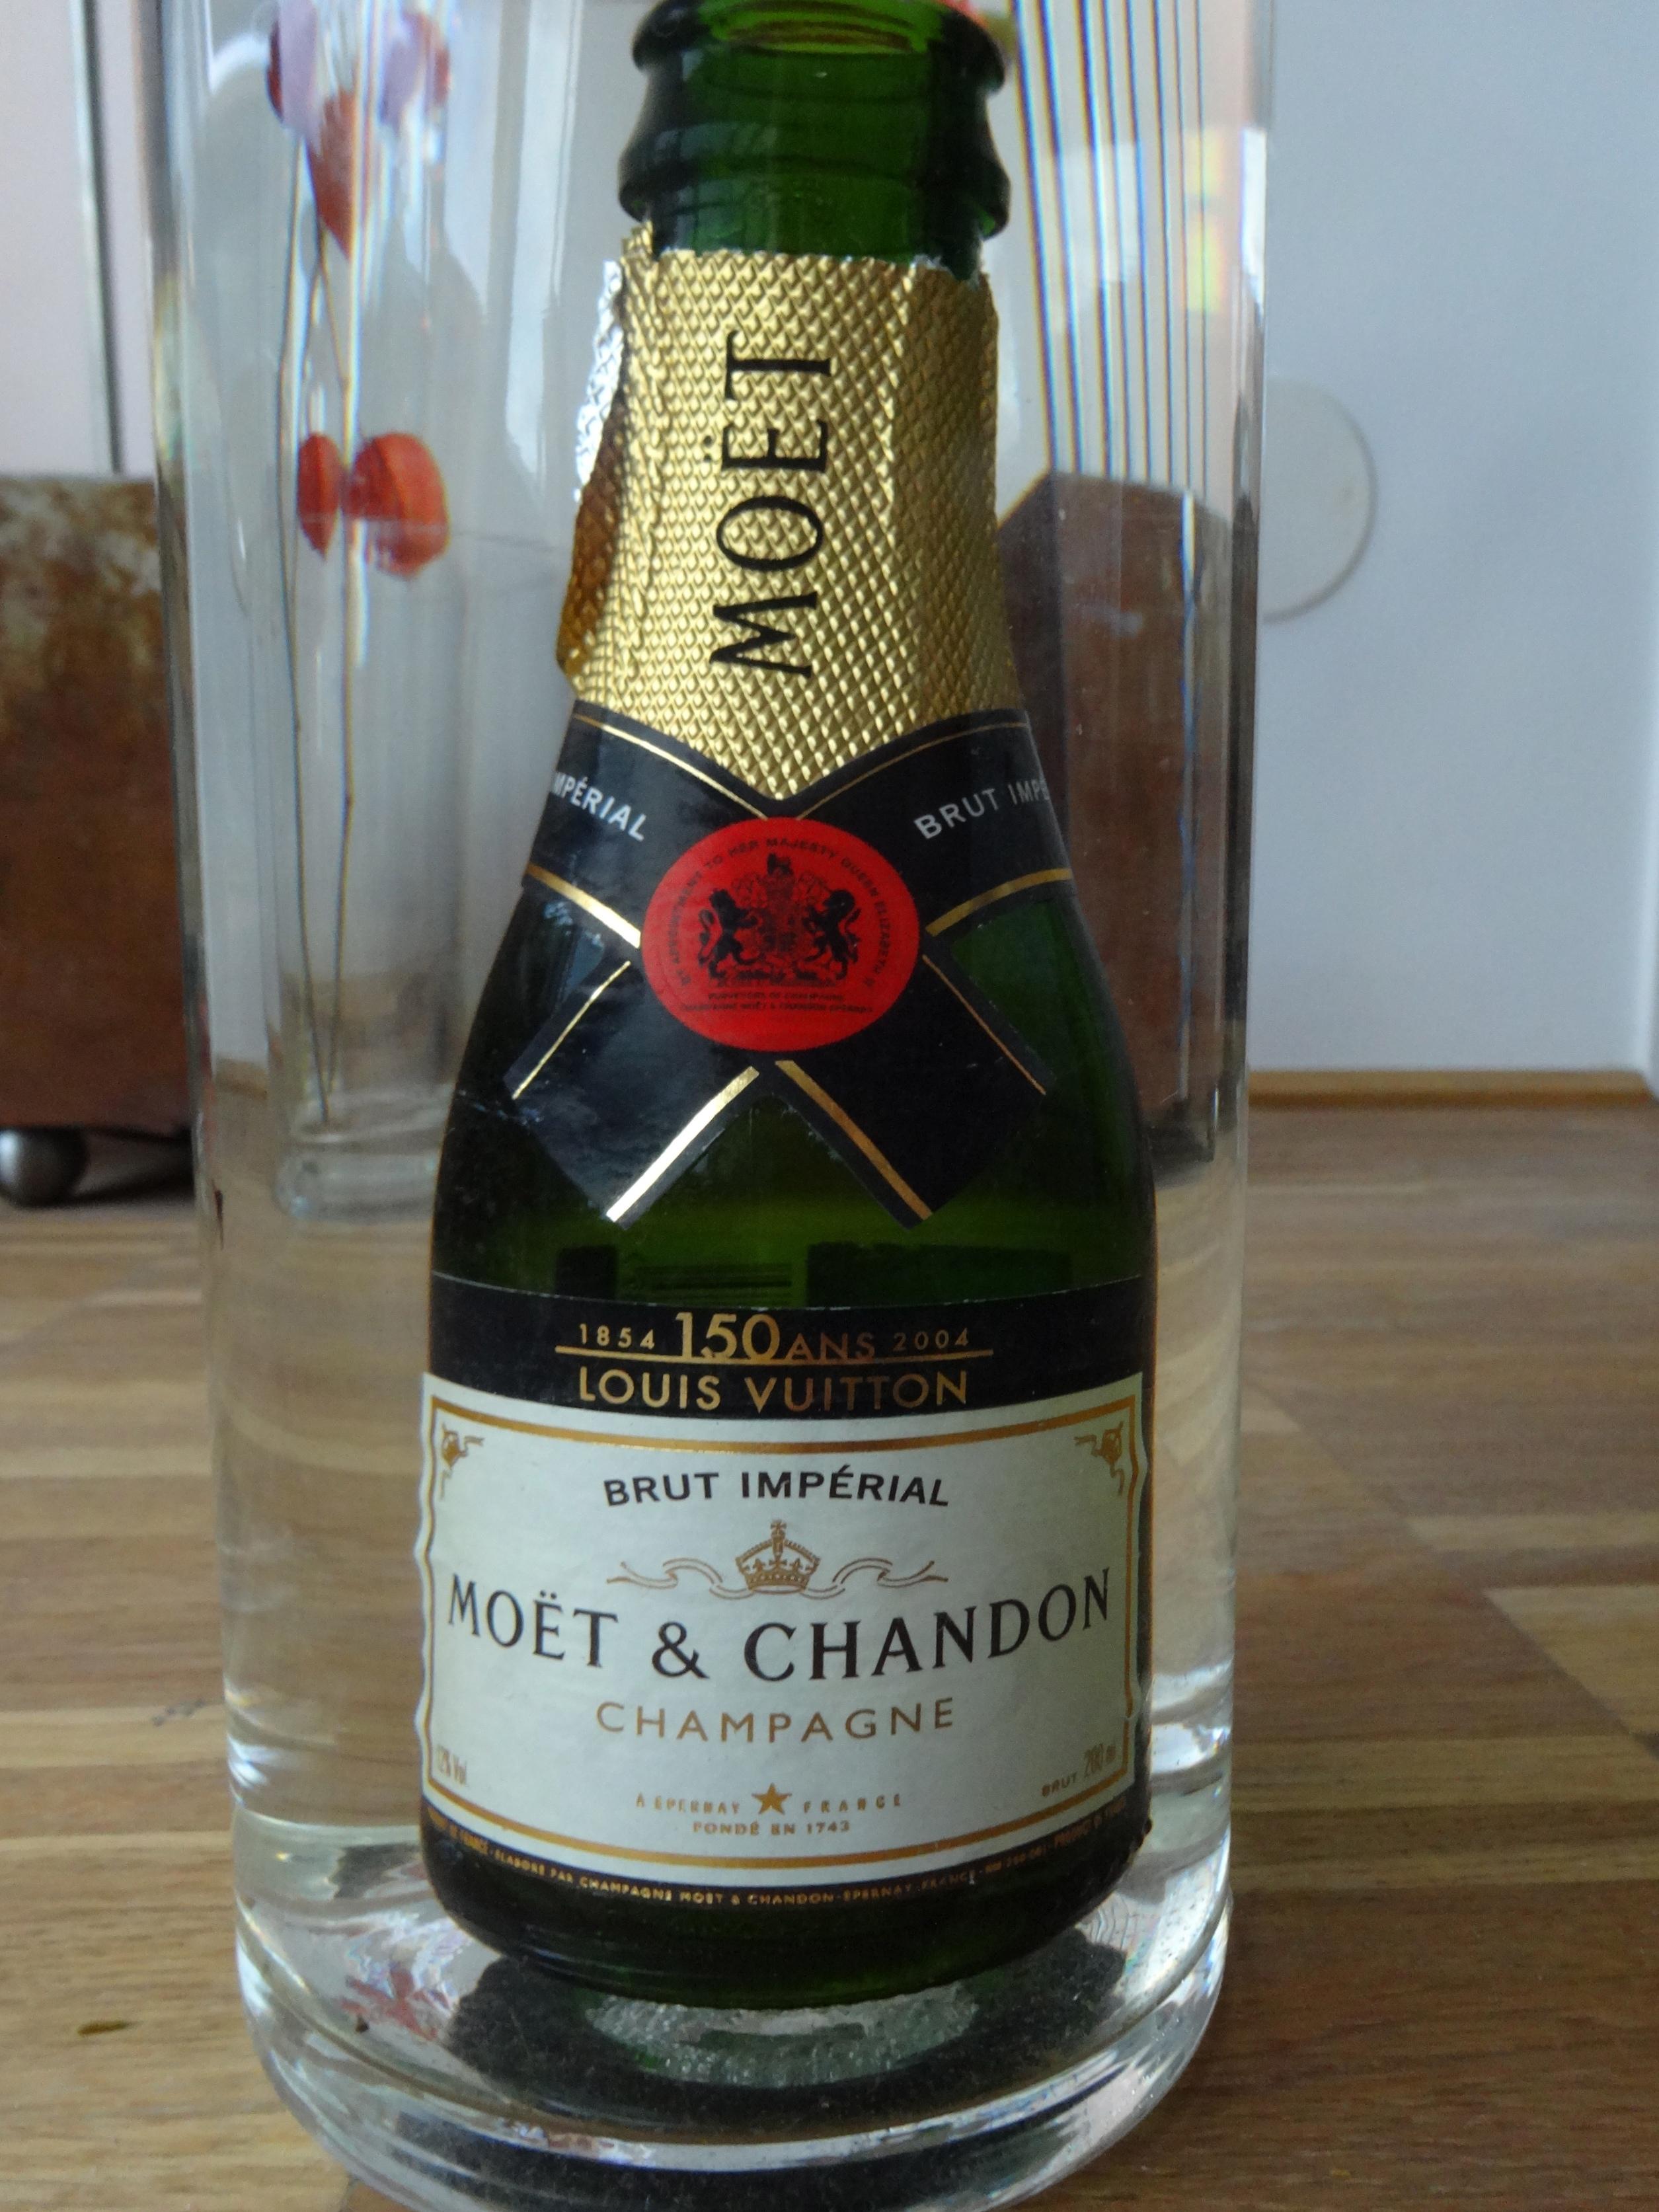 empty anniversary bottle / leere Jubiläumsflasche